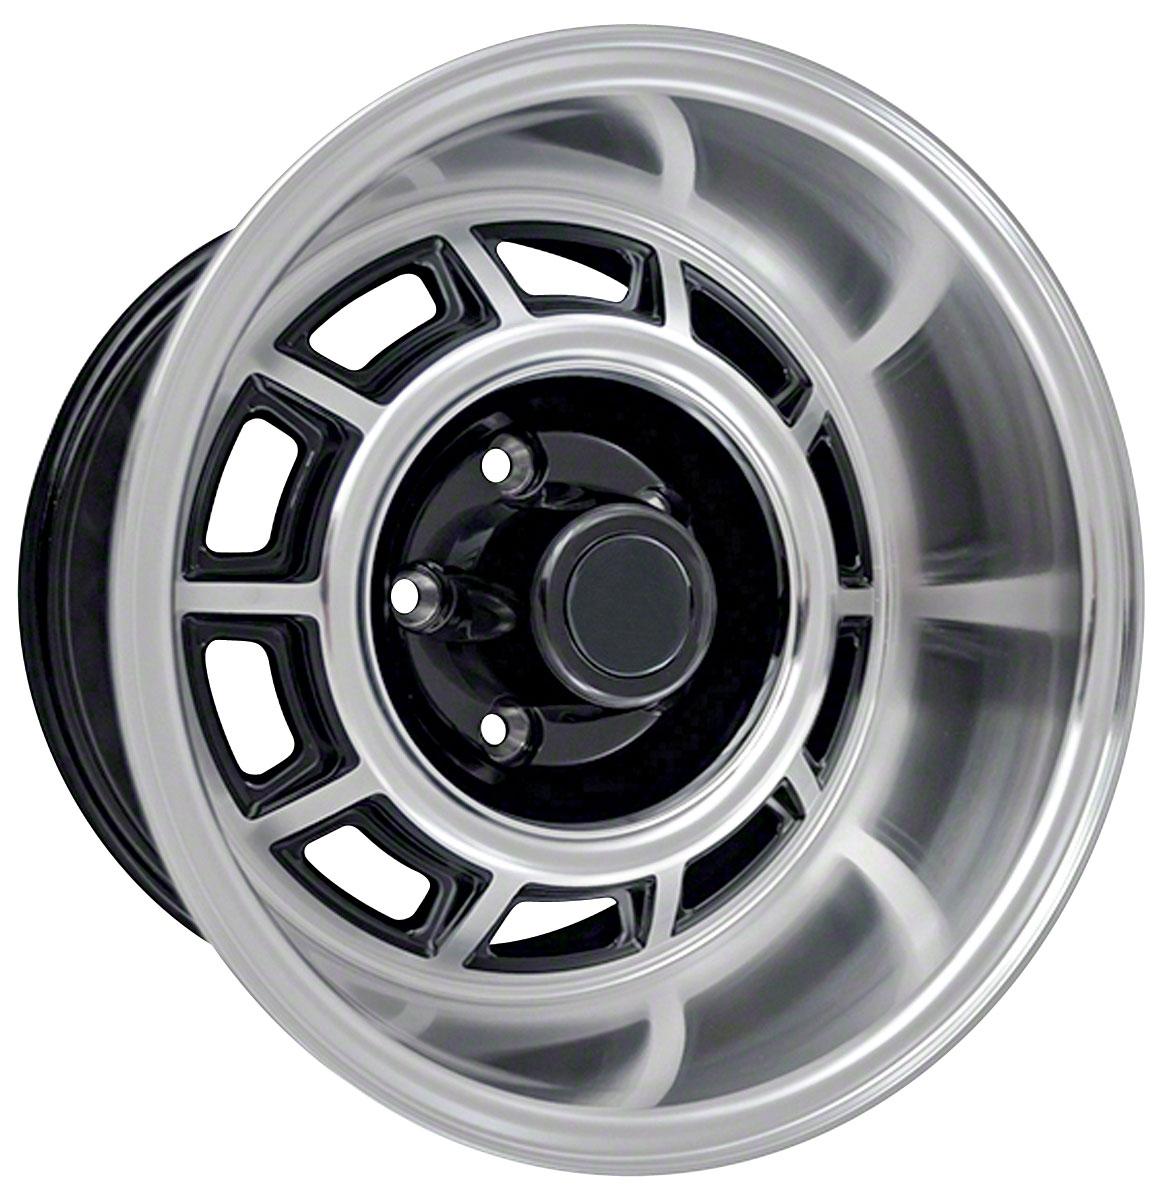 "Wheel, Aluminum, 1986-87 Grand National, 15"" X 7"", 3-3/4"" BS"